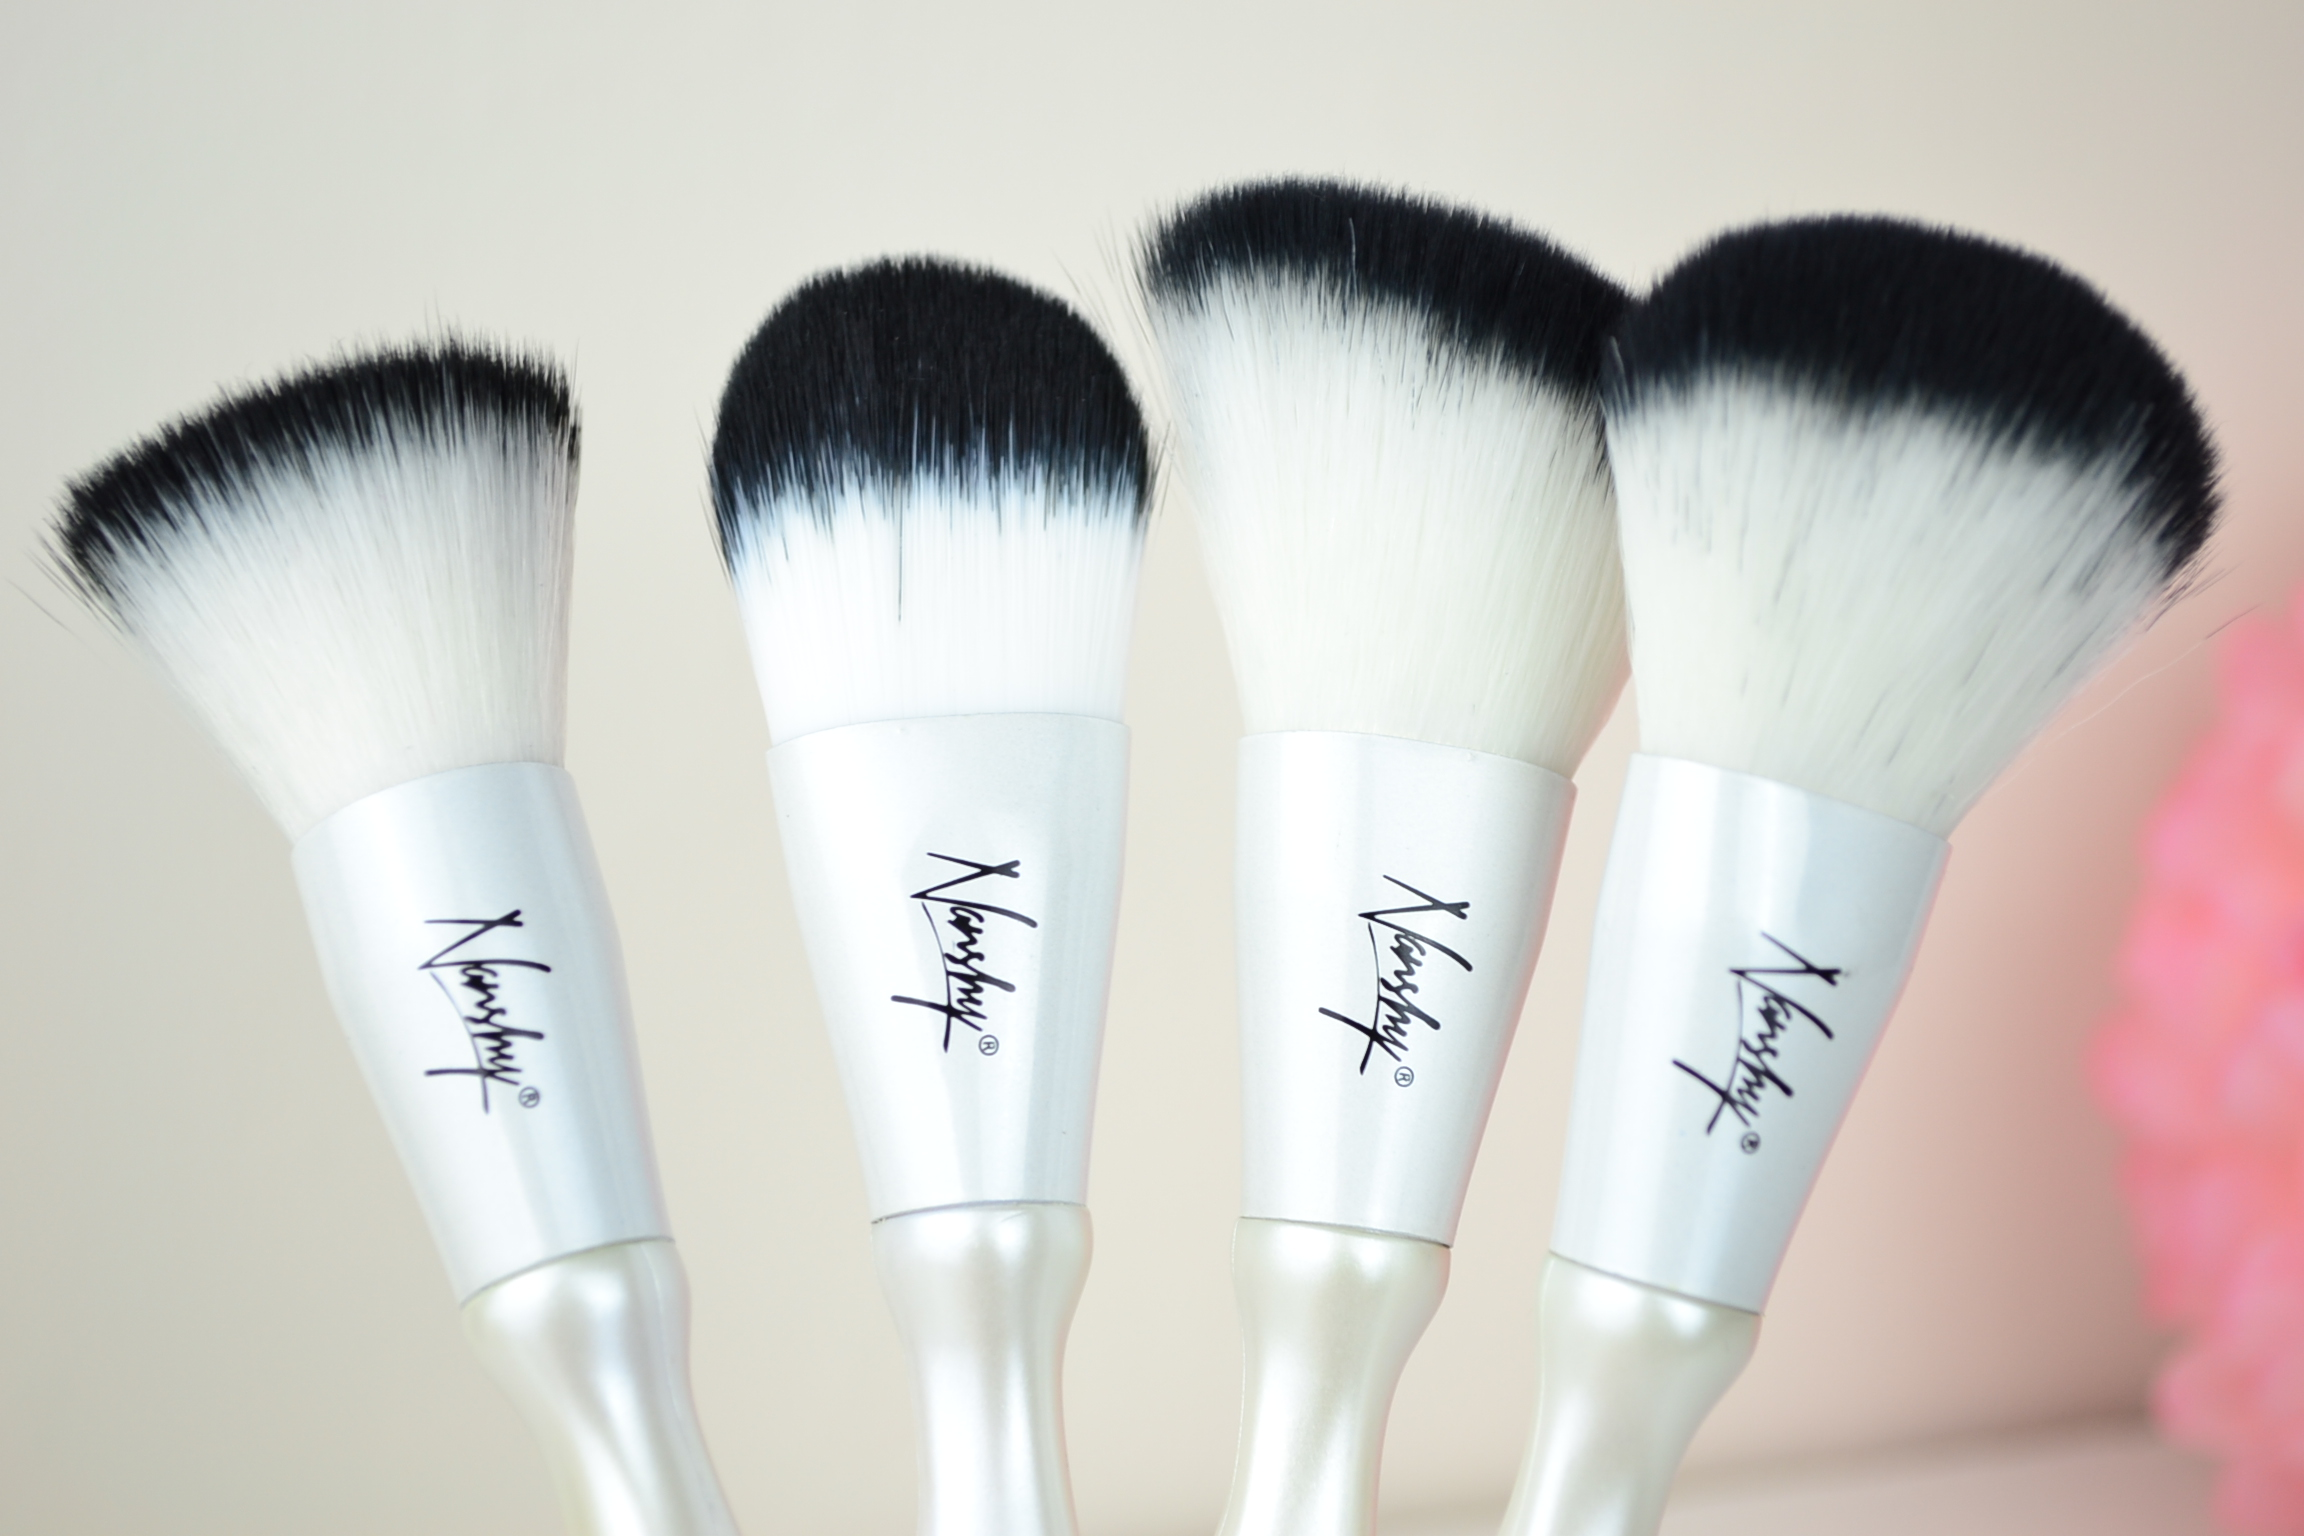 nanshy-makeup-brush-set